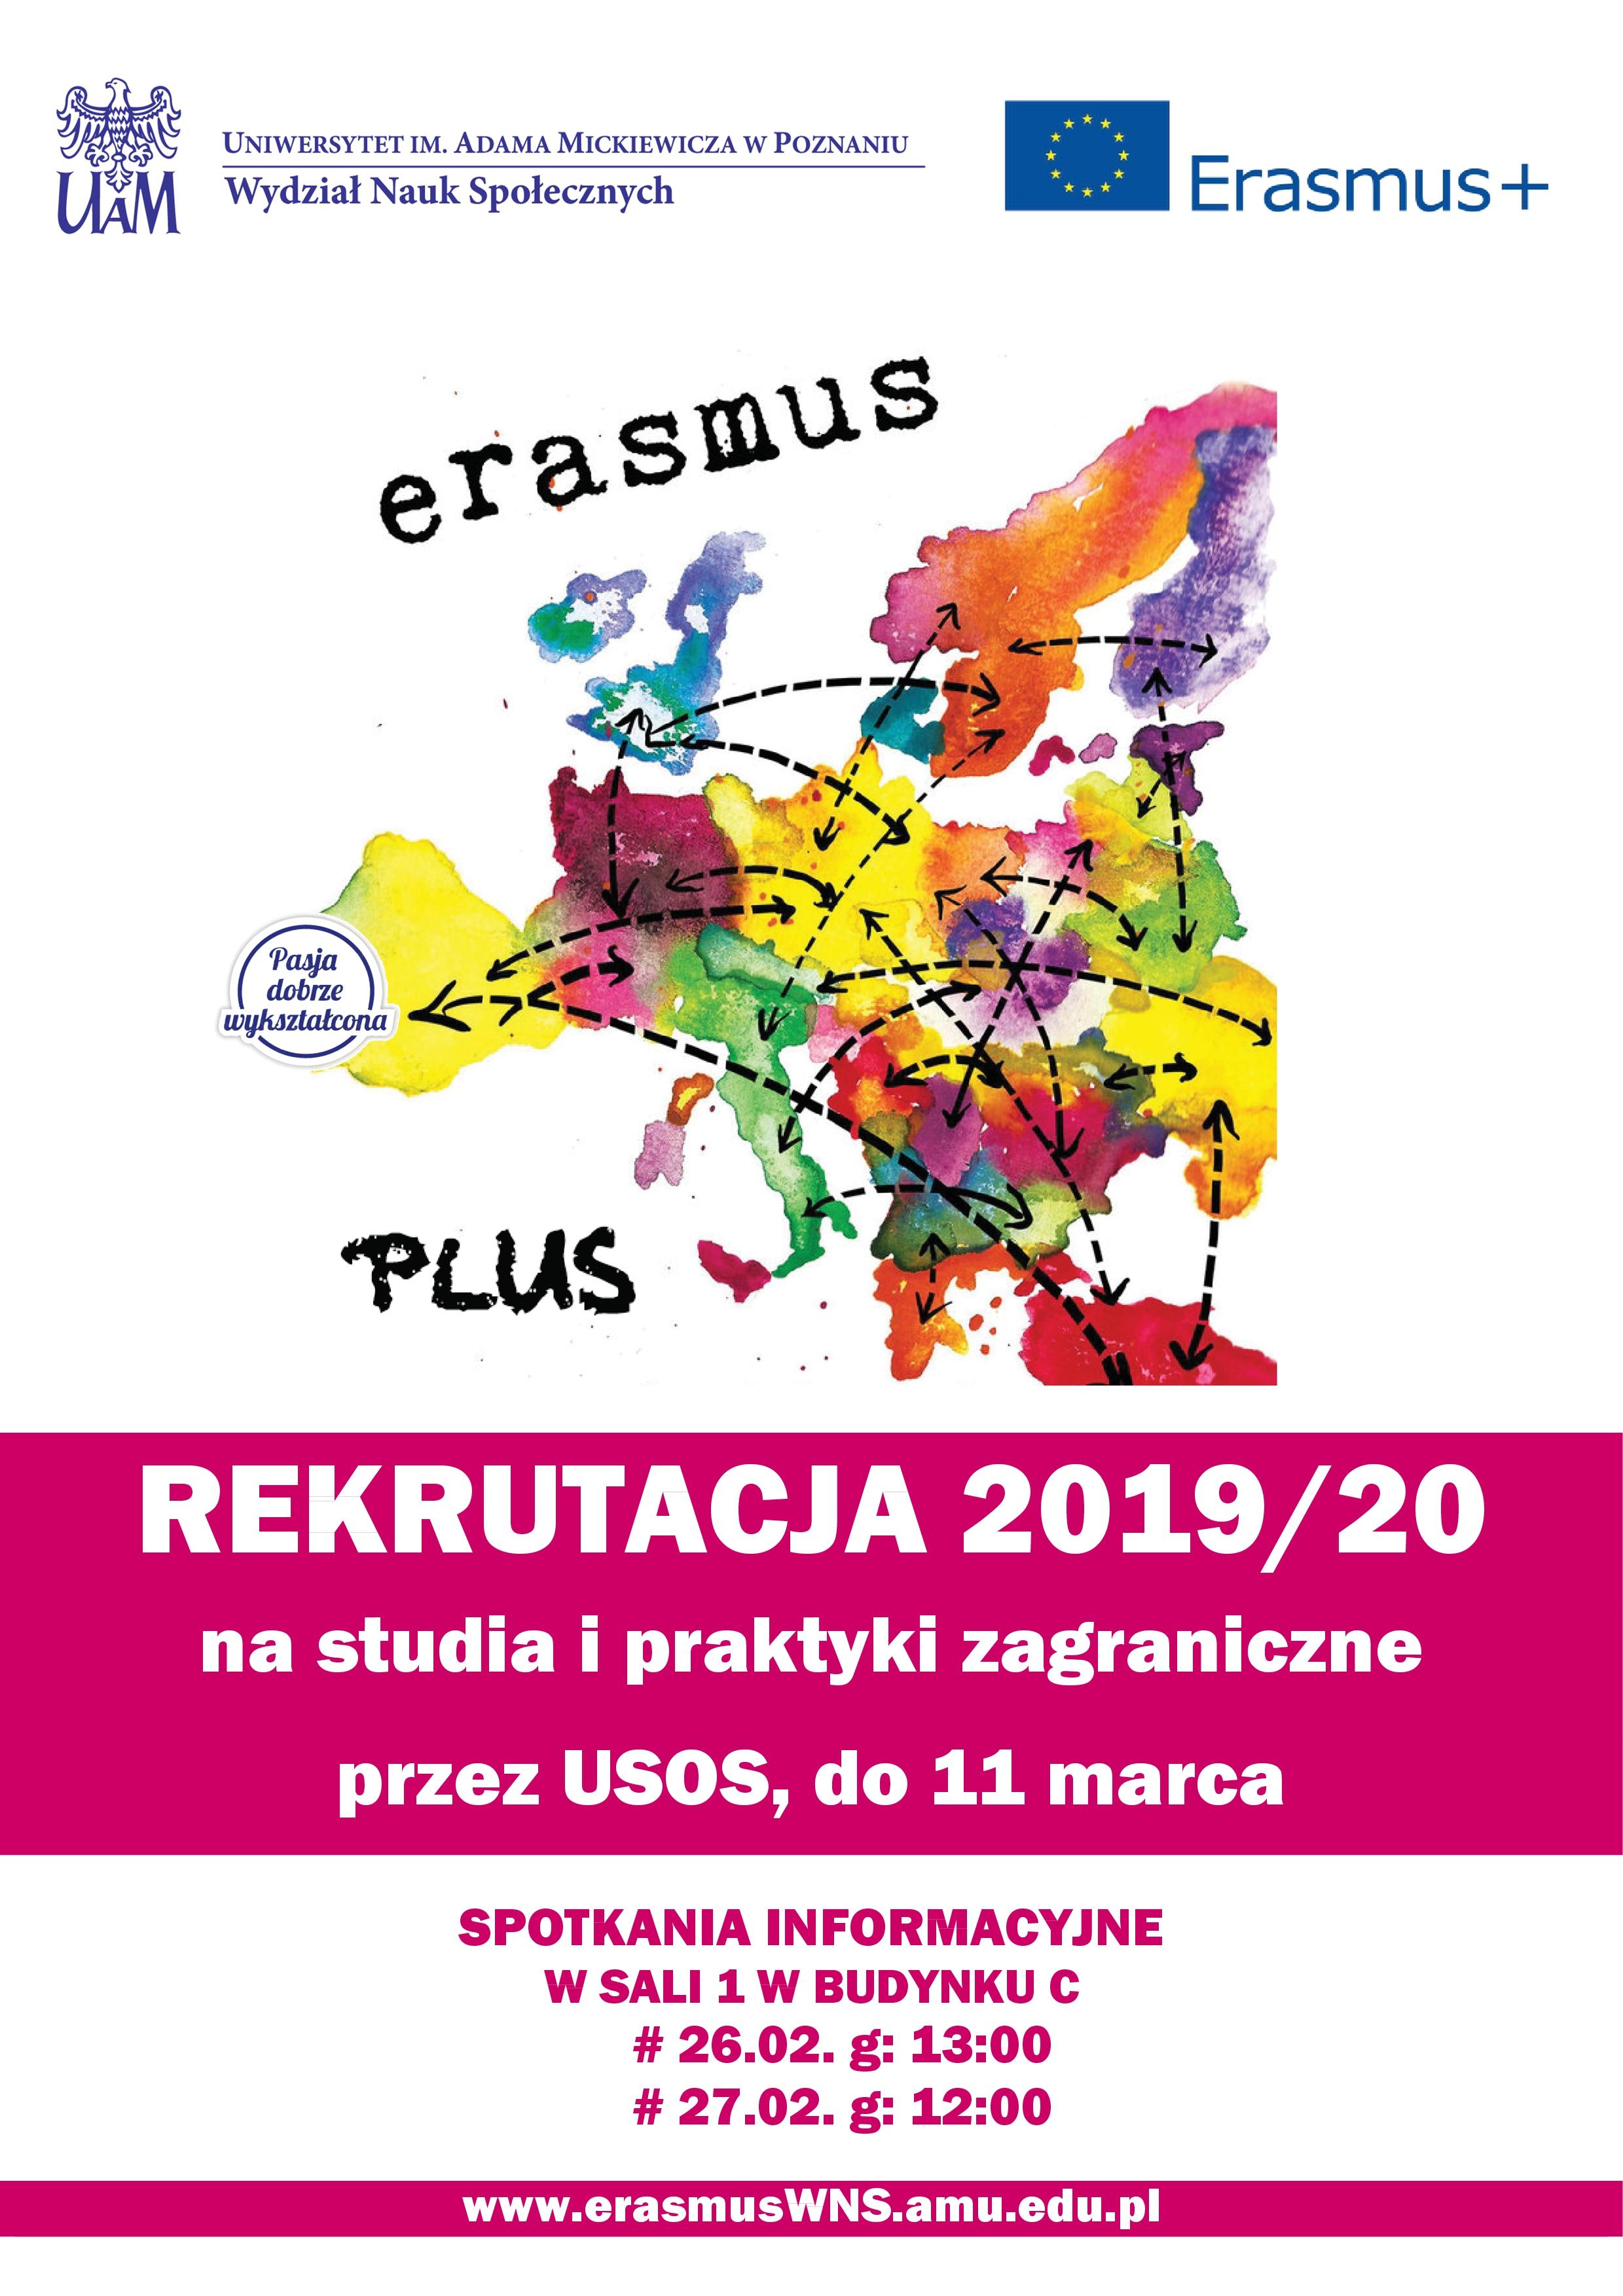 Rekrutacja na praktyki Erasmus 2019/2020